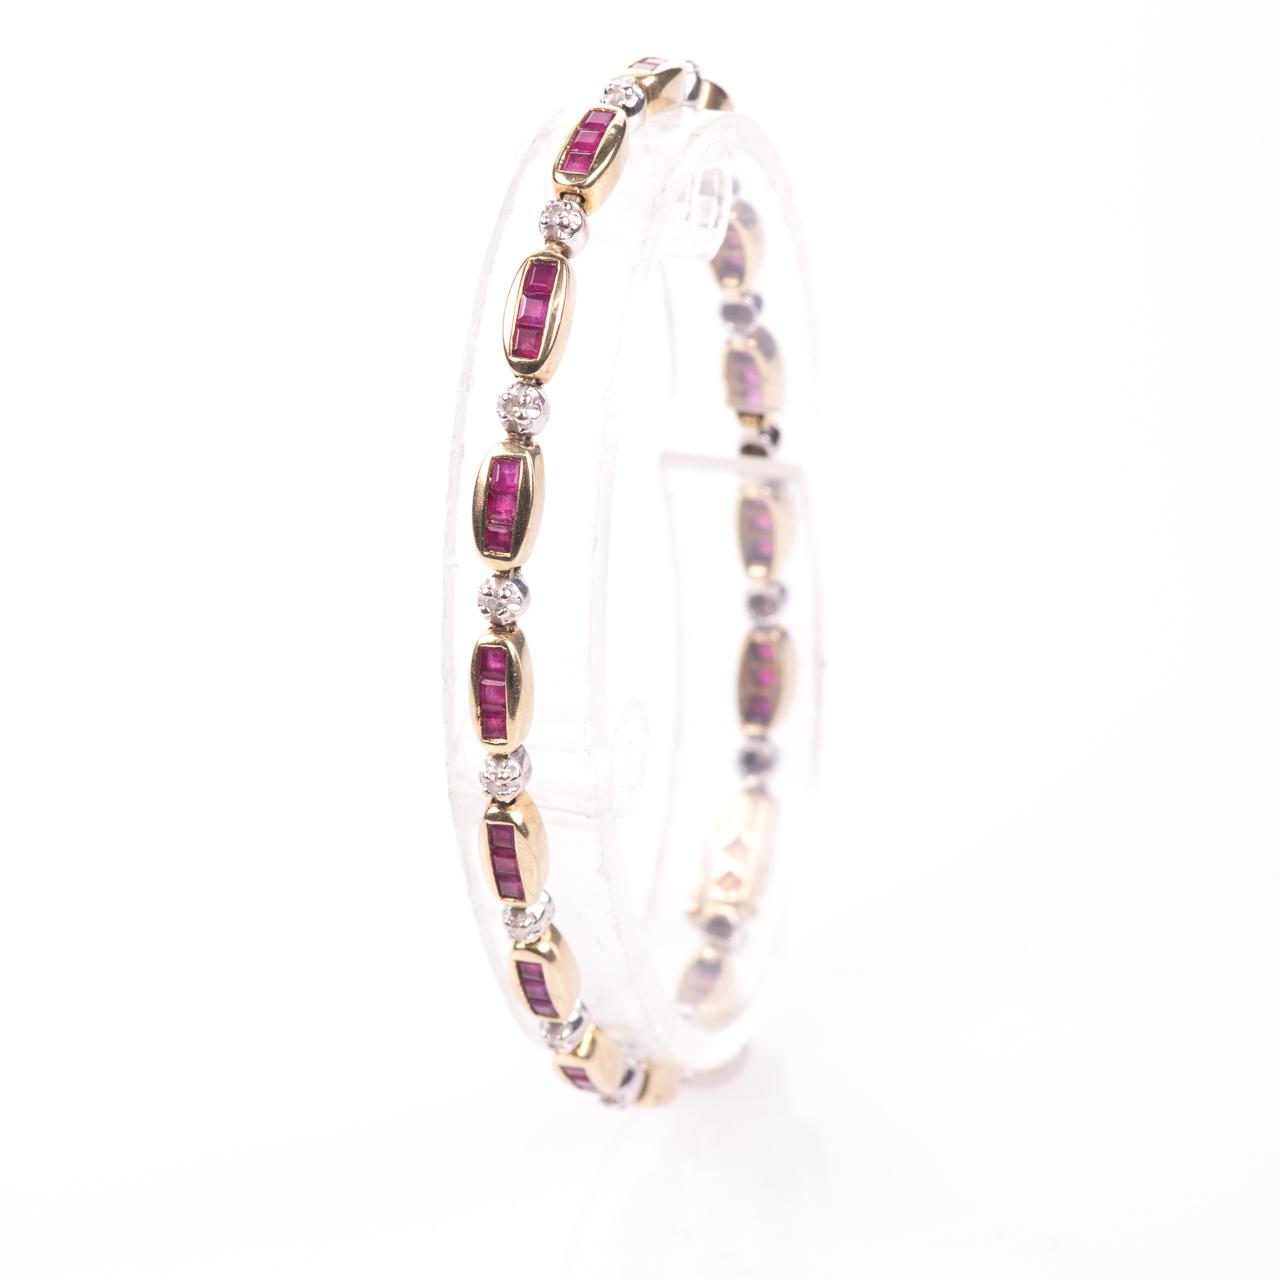 9ct Gold 2ct Ruby & Diamond Tennis Bracelet